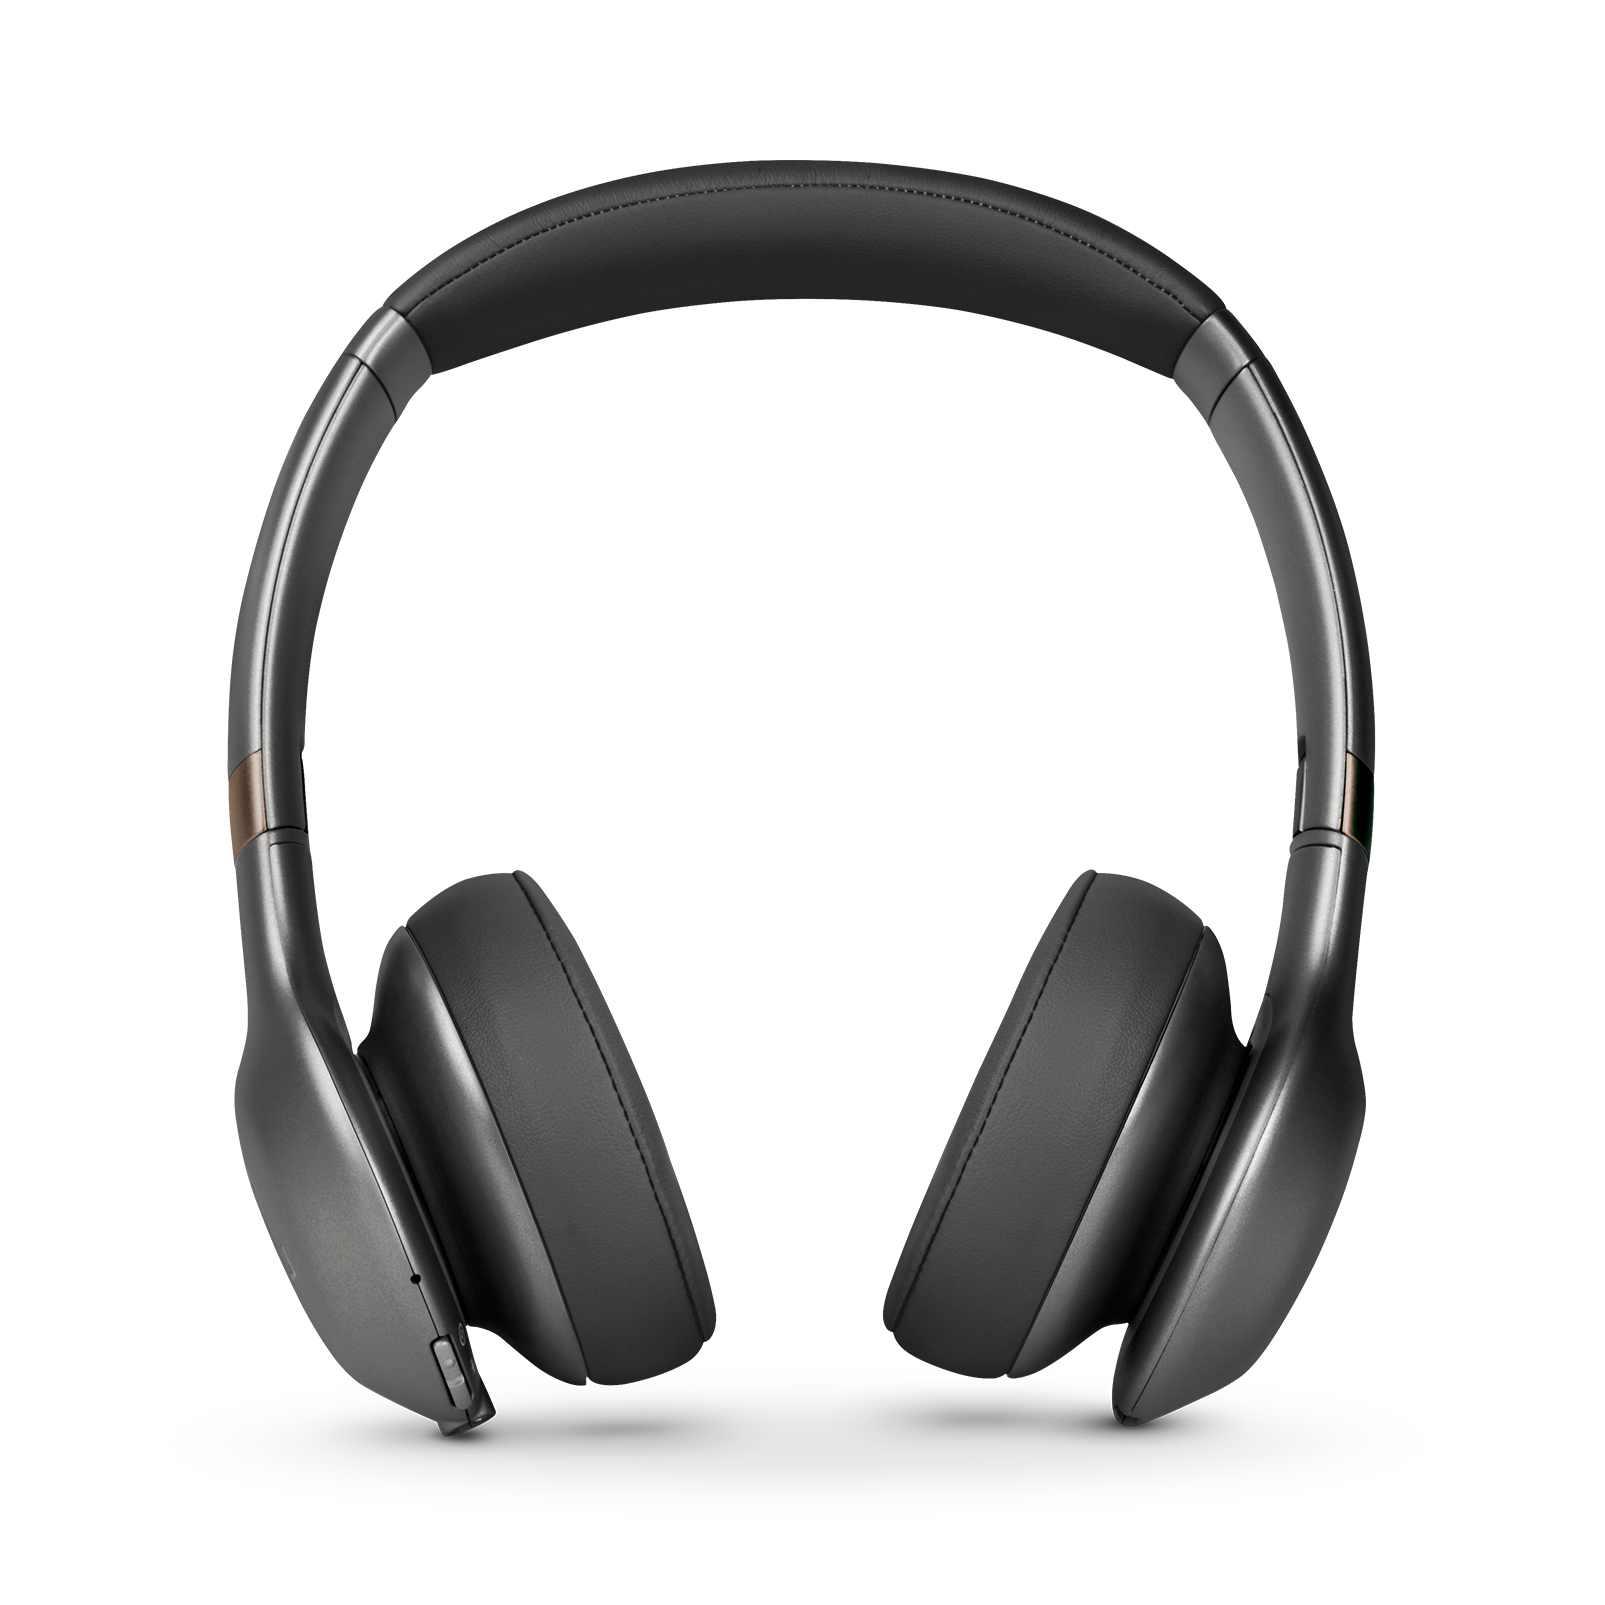 Fone de Ouvido Bluetooth JBL Everest 310GA - Cinza JBLV310GABTGML